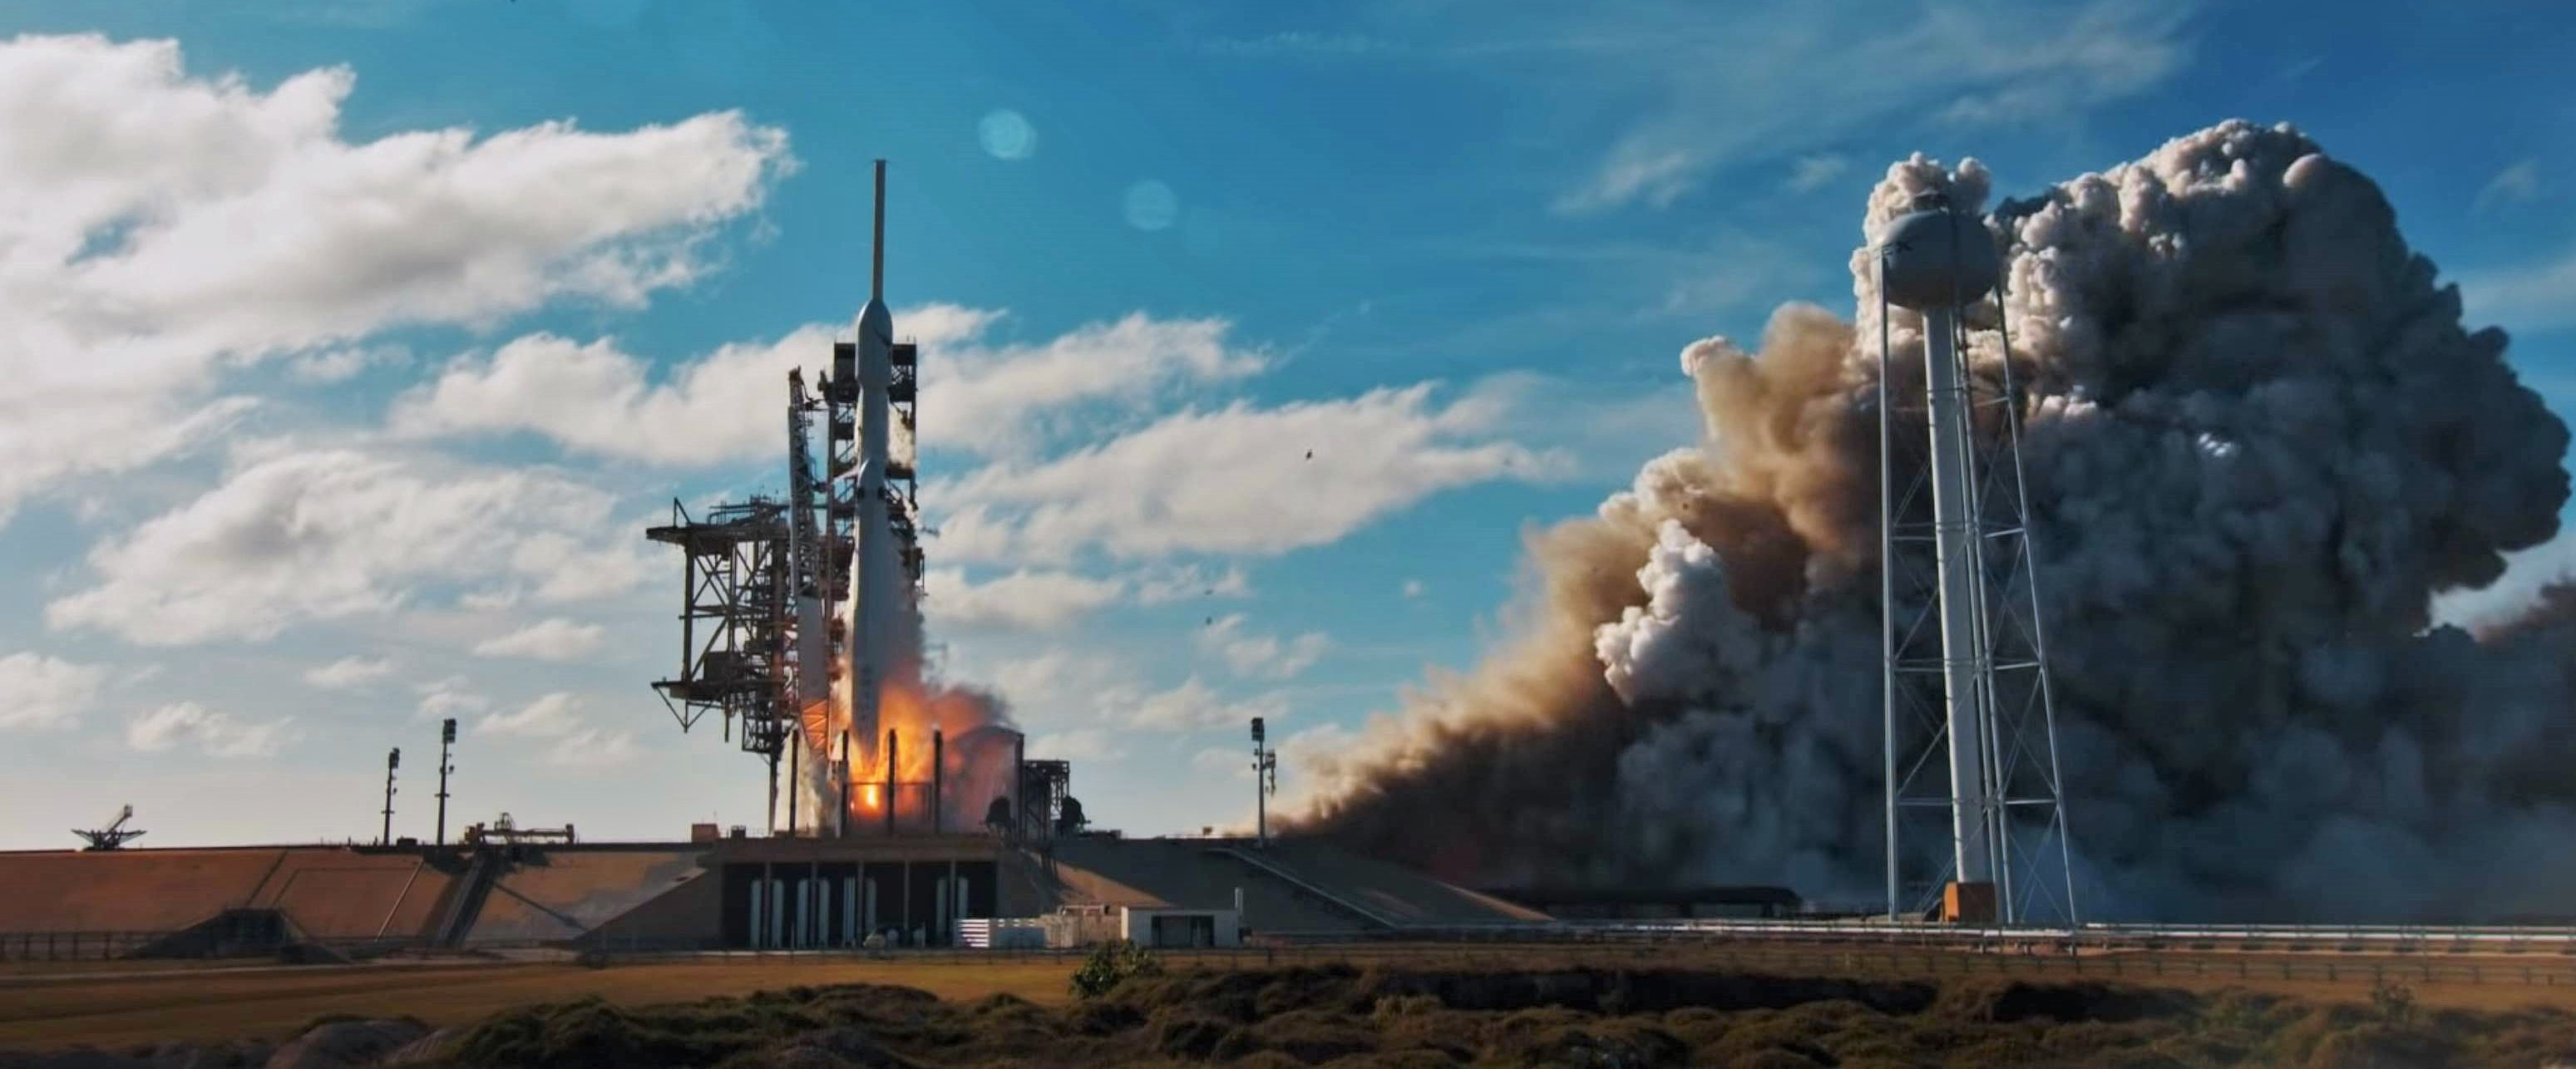 Falcon Heavy Flight 1 liftoff (SpaceX) 1 edit